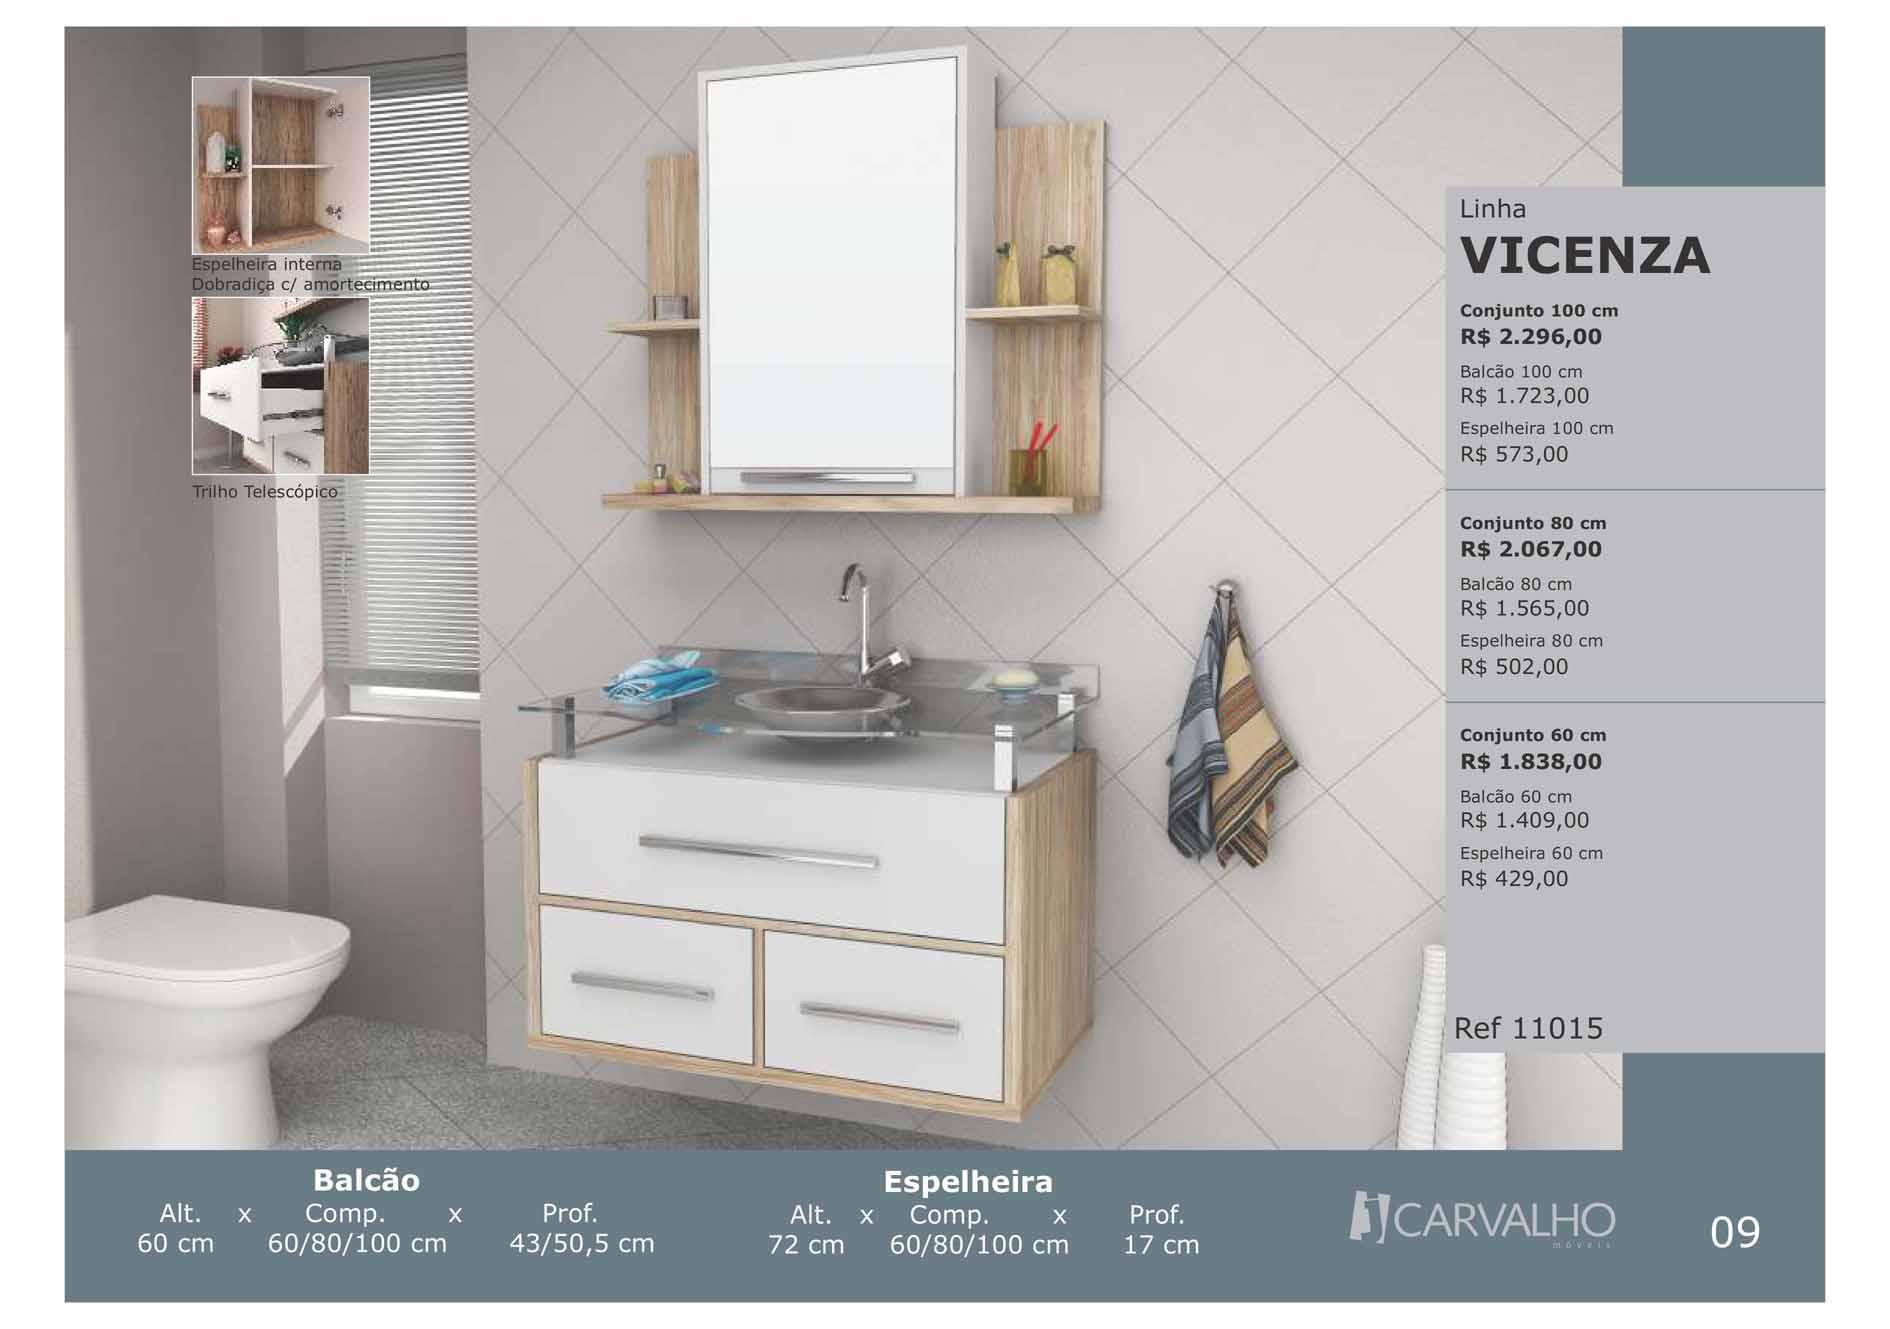 Vicenza – Ref 11015